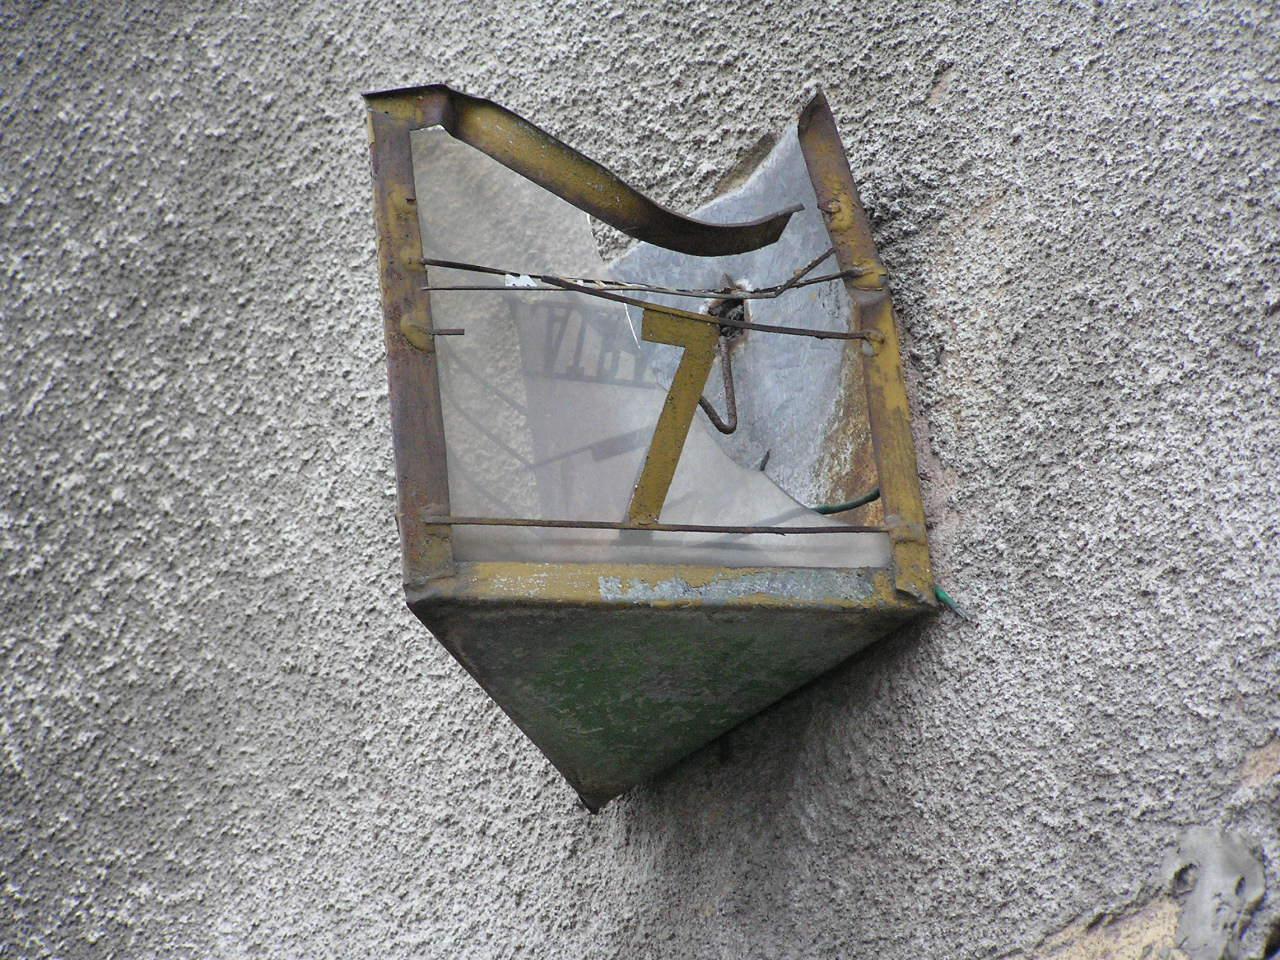 Latarenka adresowa - Wiatraczna 7